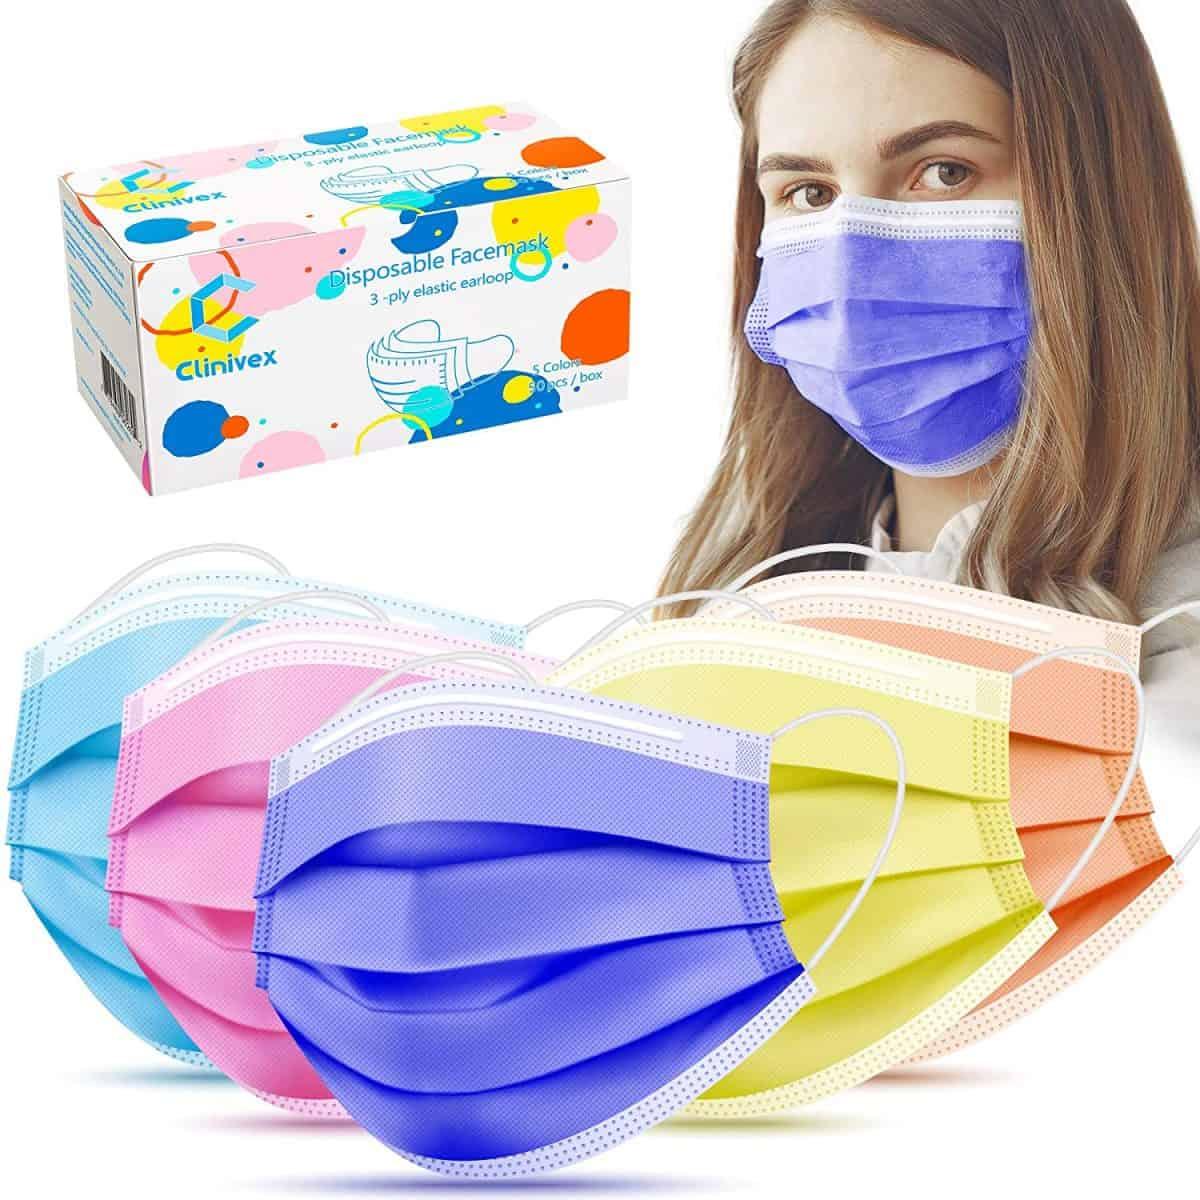 Clinivex Colored Face Masks